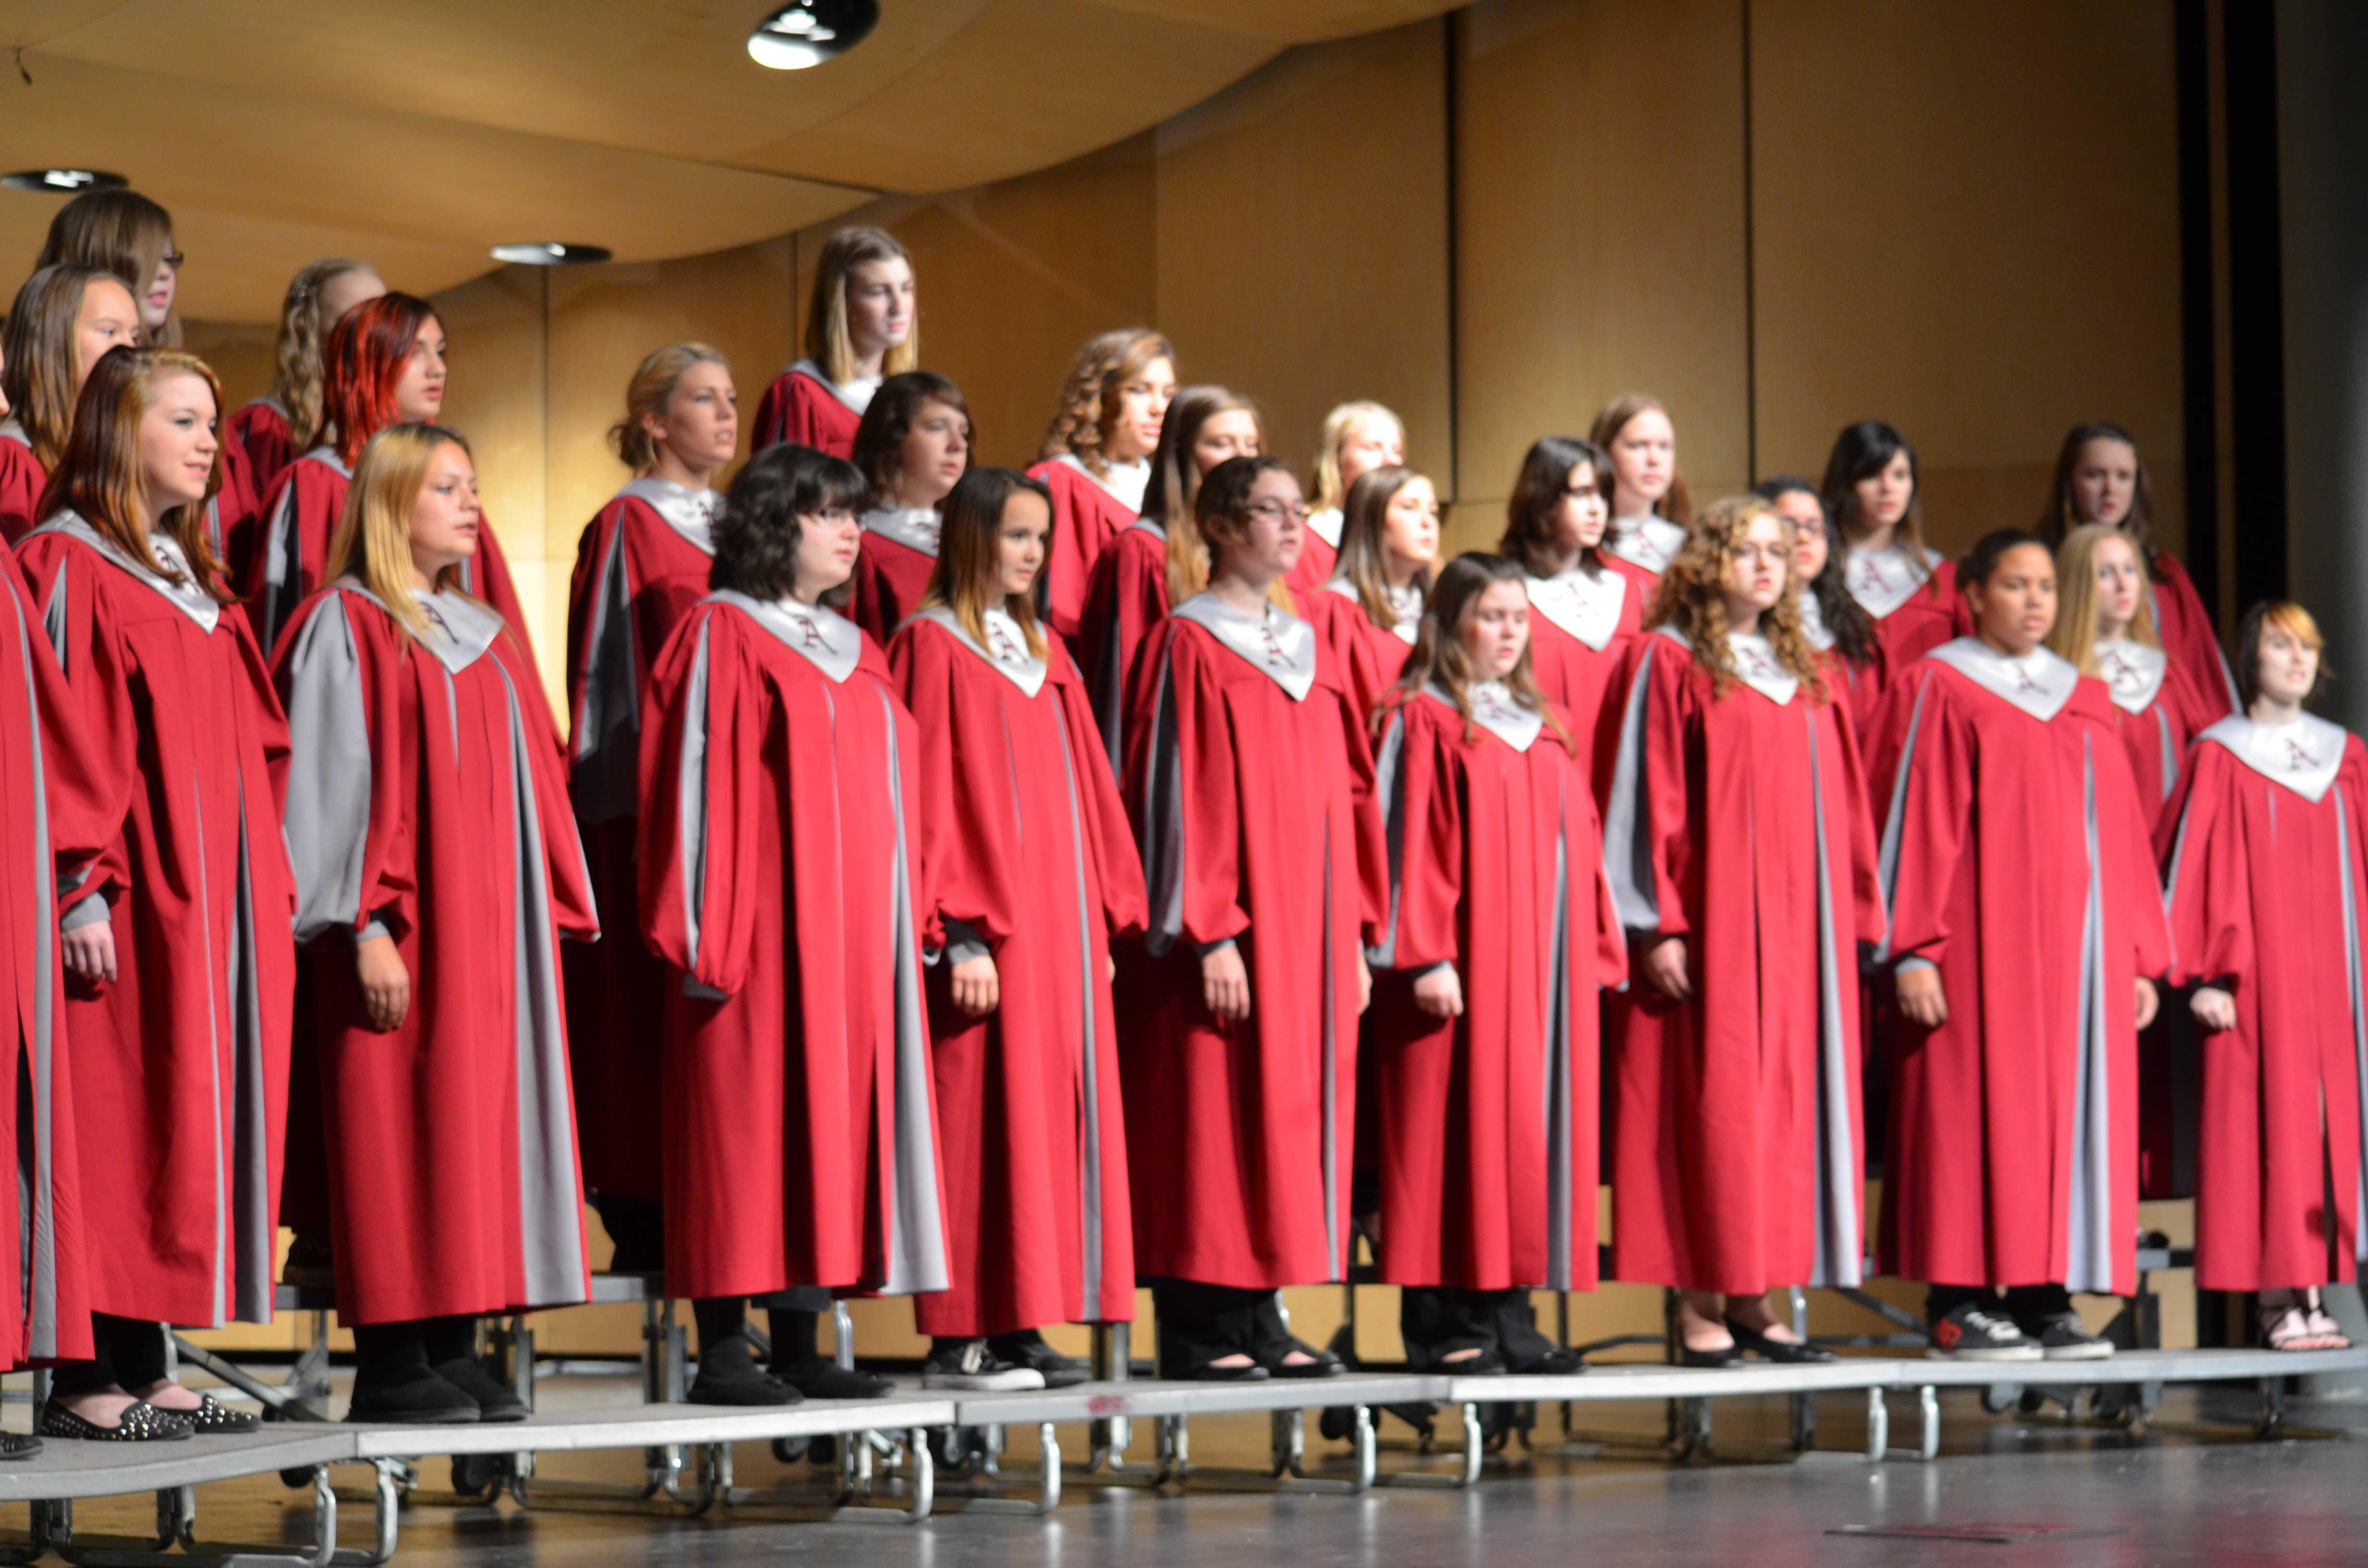 Choir Concert Ends on a Good Note